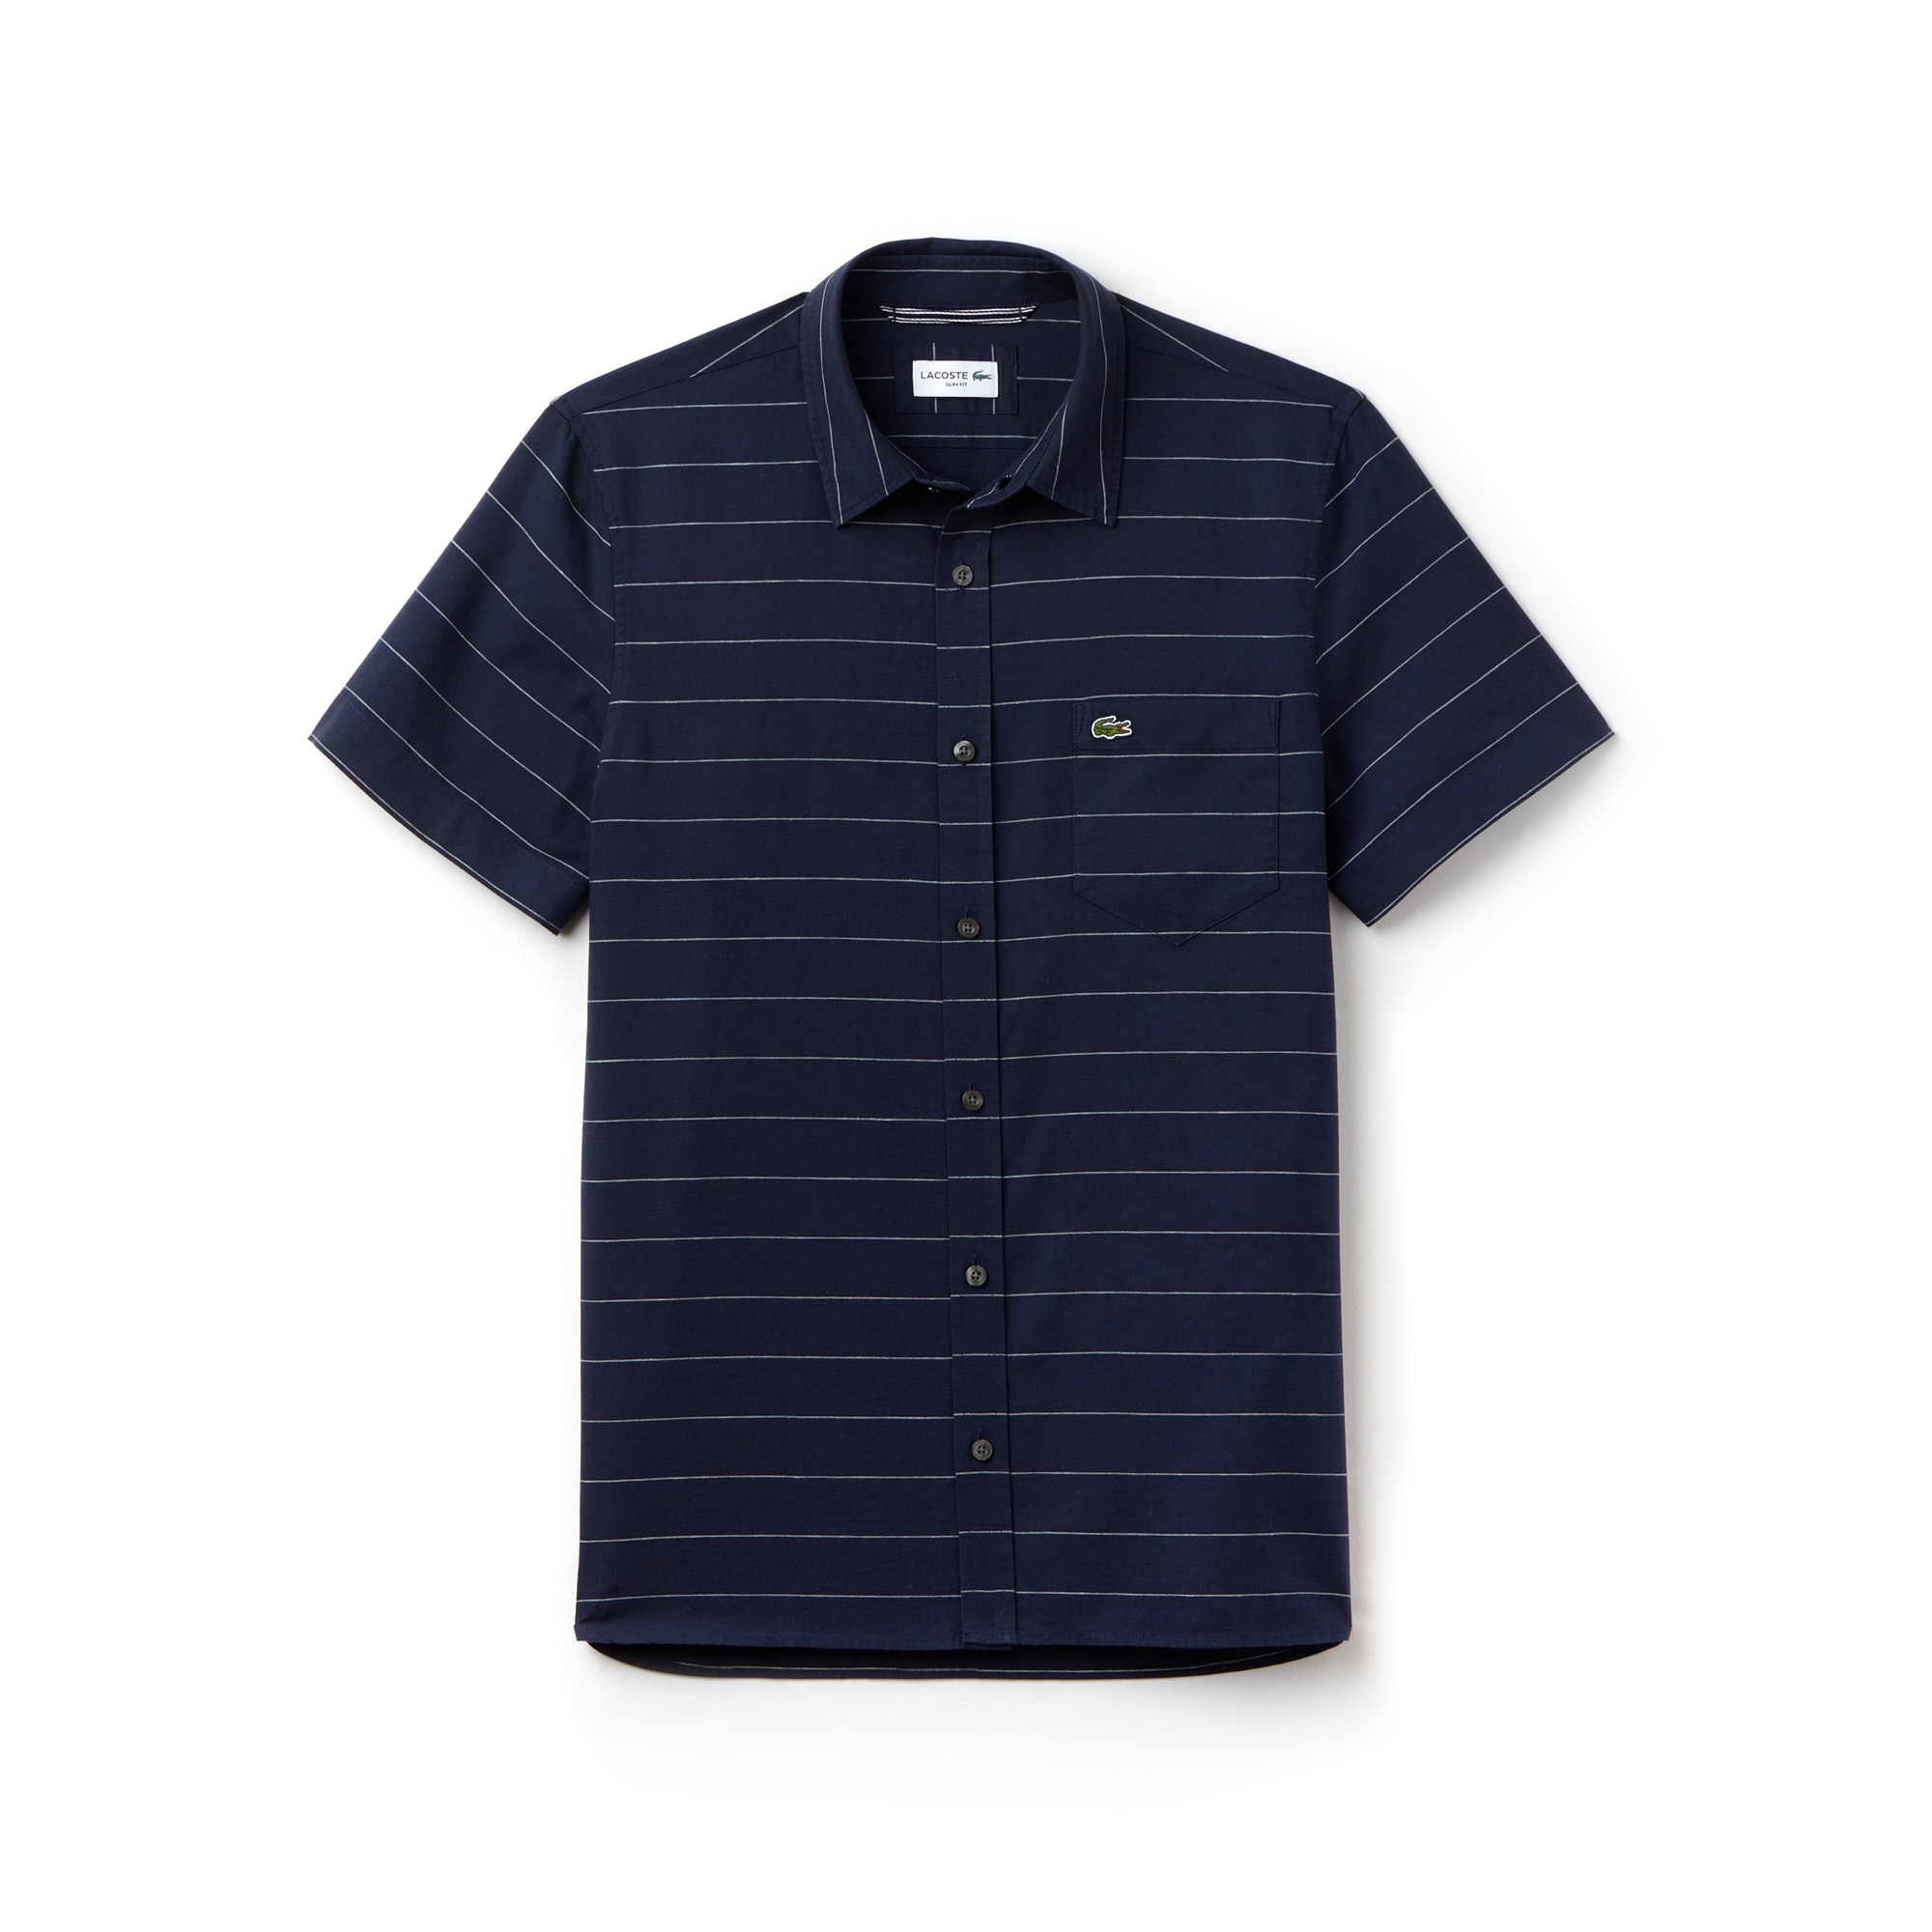 Men's Slim Fit Striped Oxford Cotton And Linen Shirt